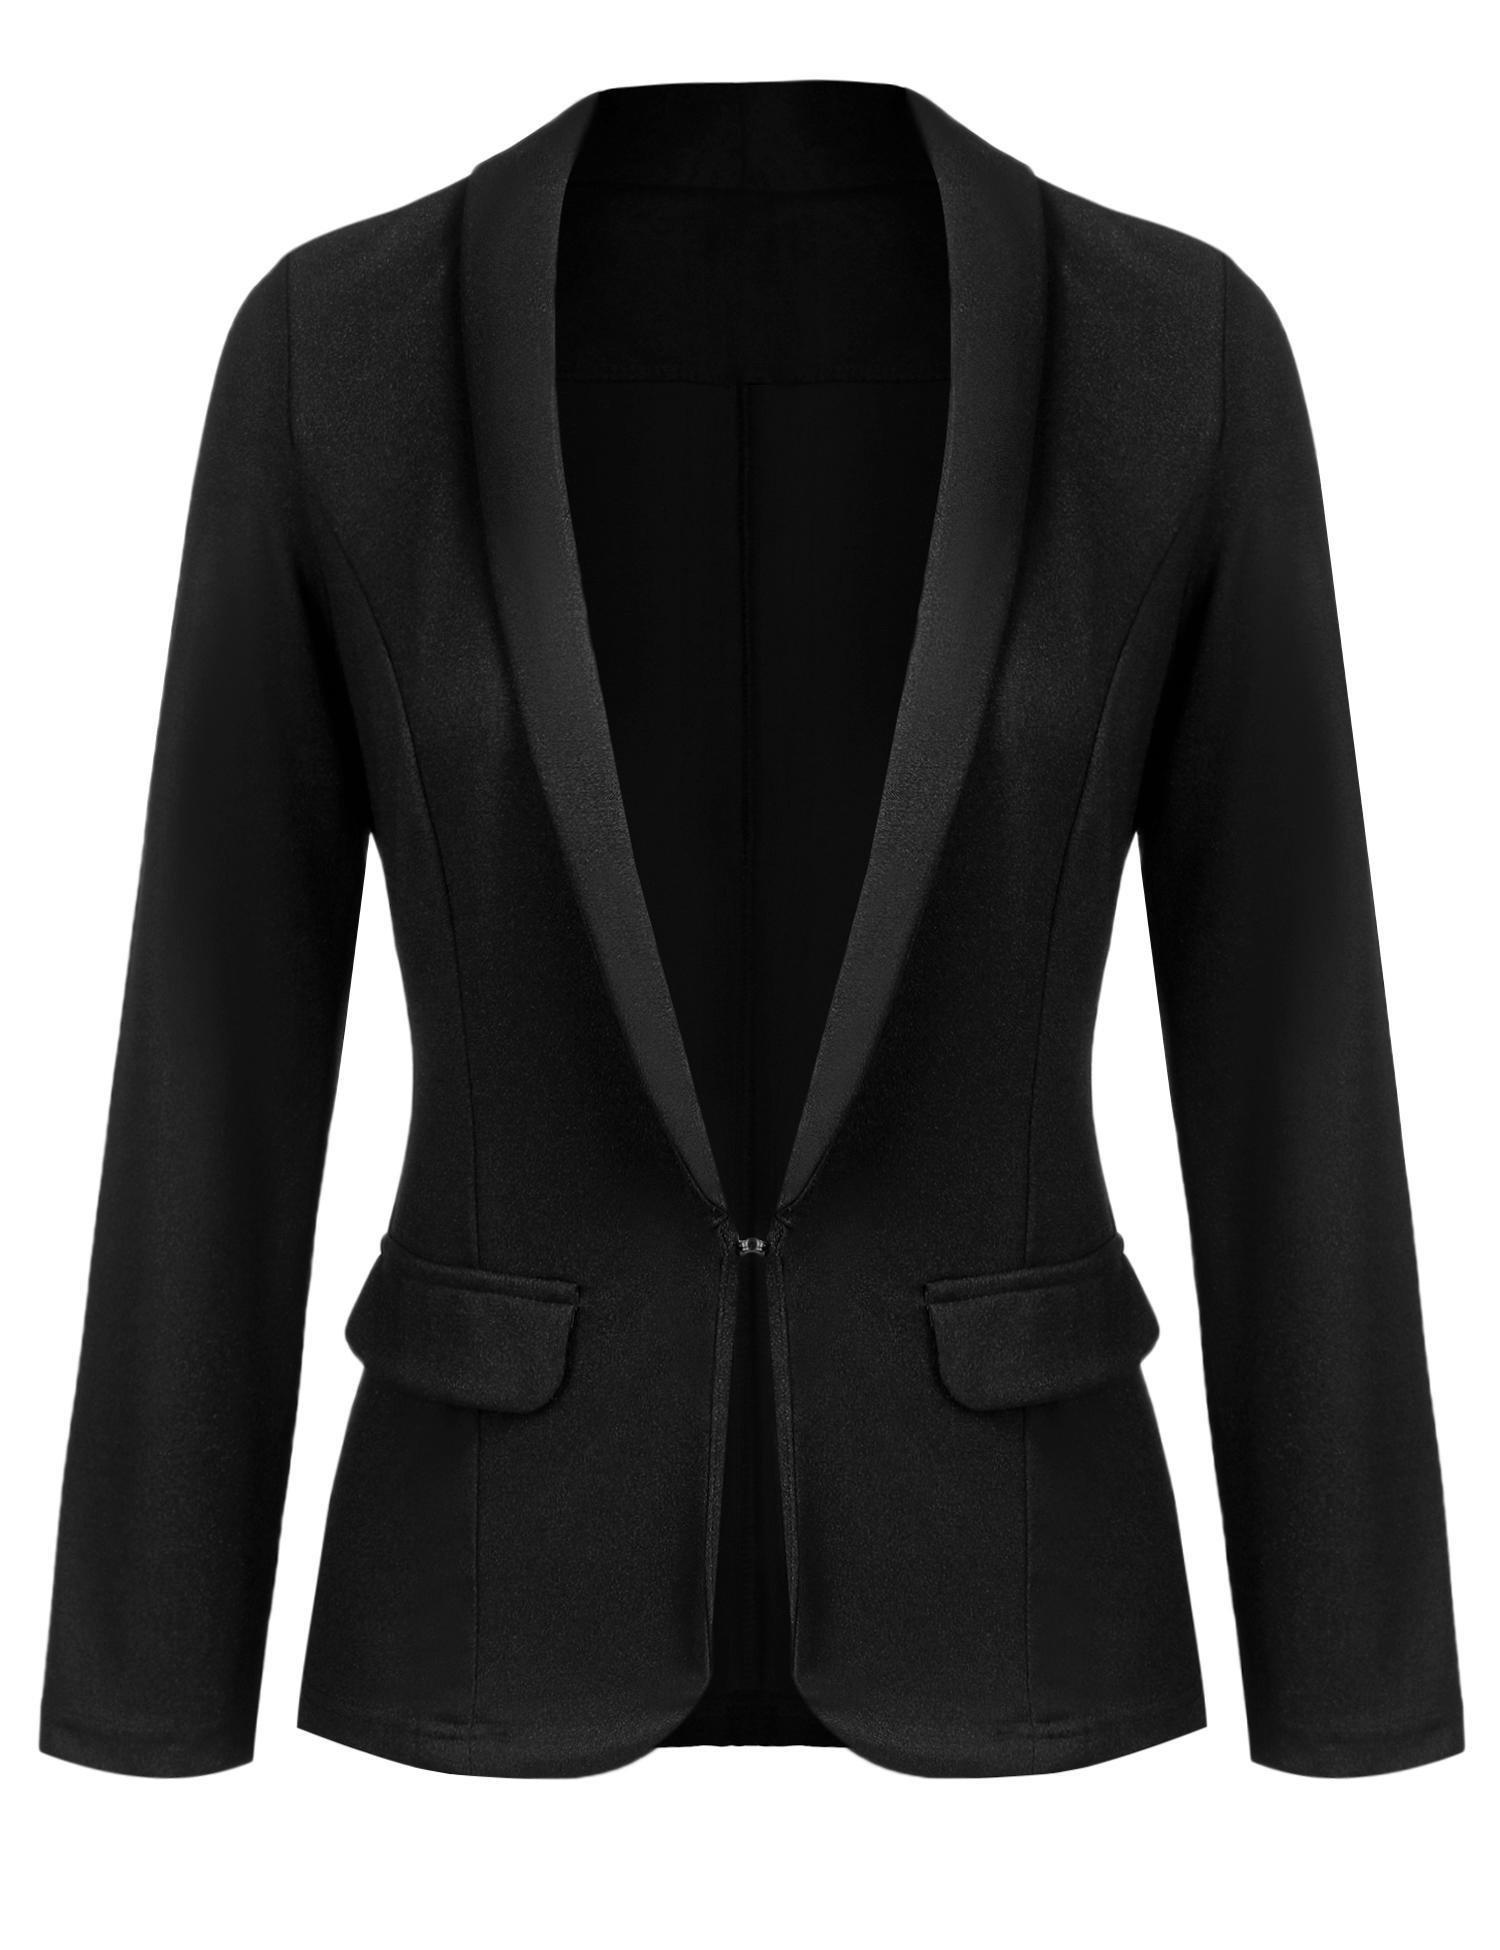 Yealsha Women's Overesized Long Sleeve Slim Fit Casual Blazer Tops